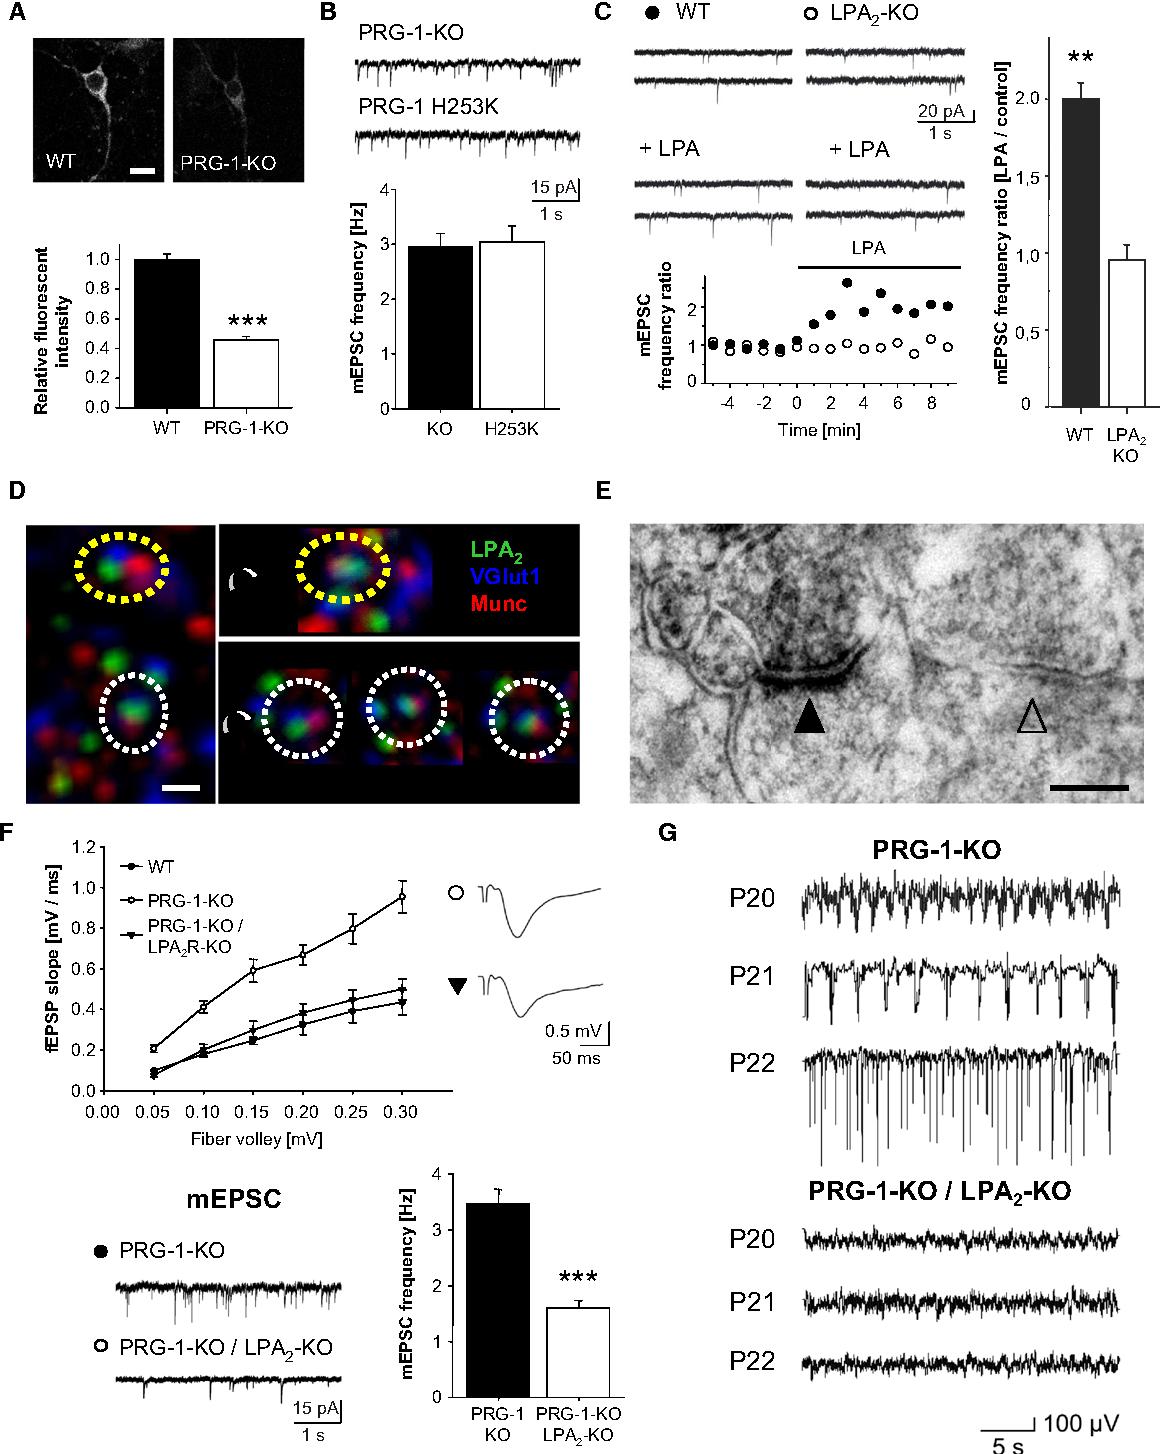 Figure 7. PRG-1 Influences Phospholipid Signaling